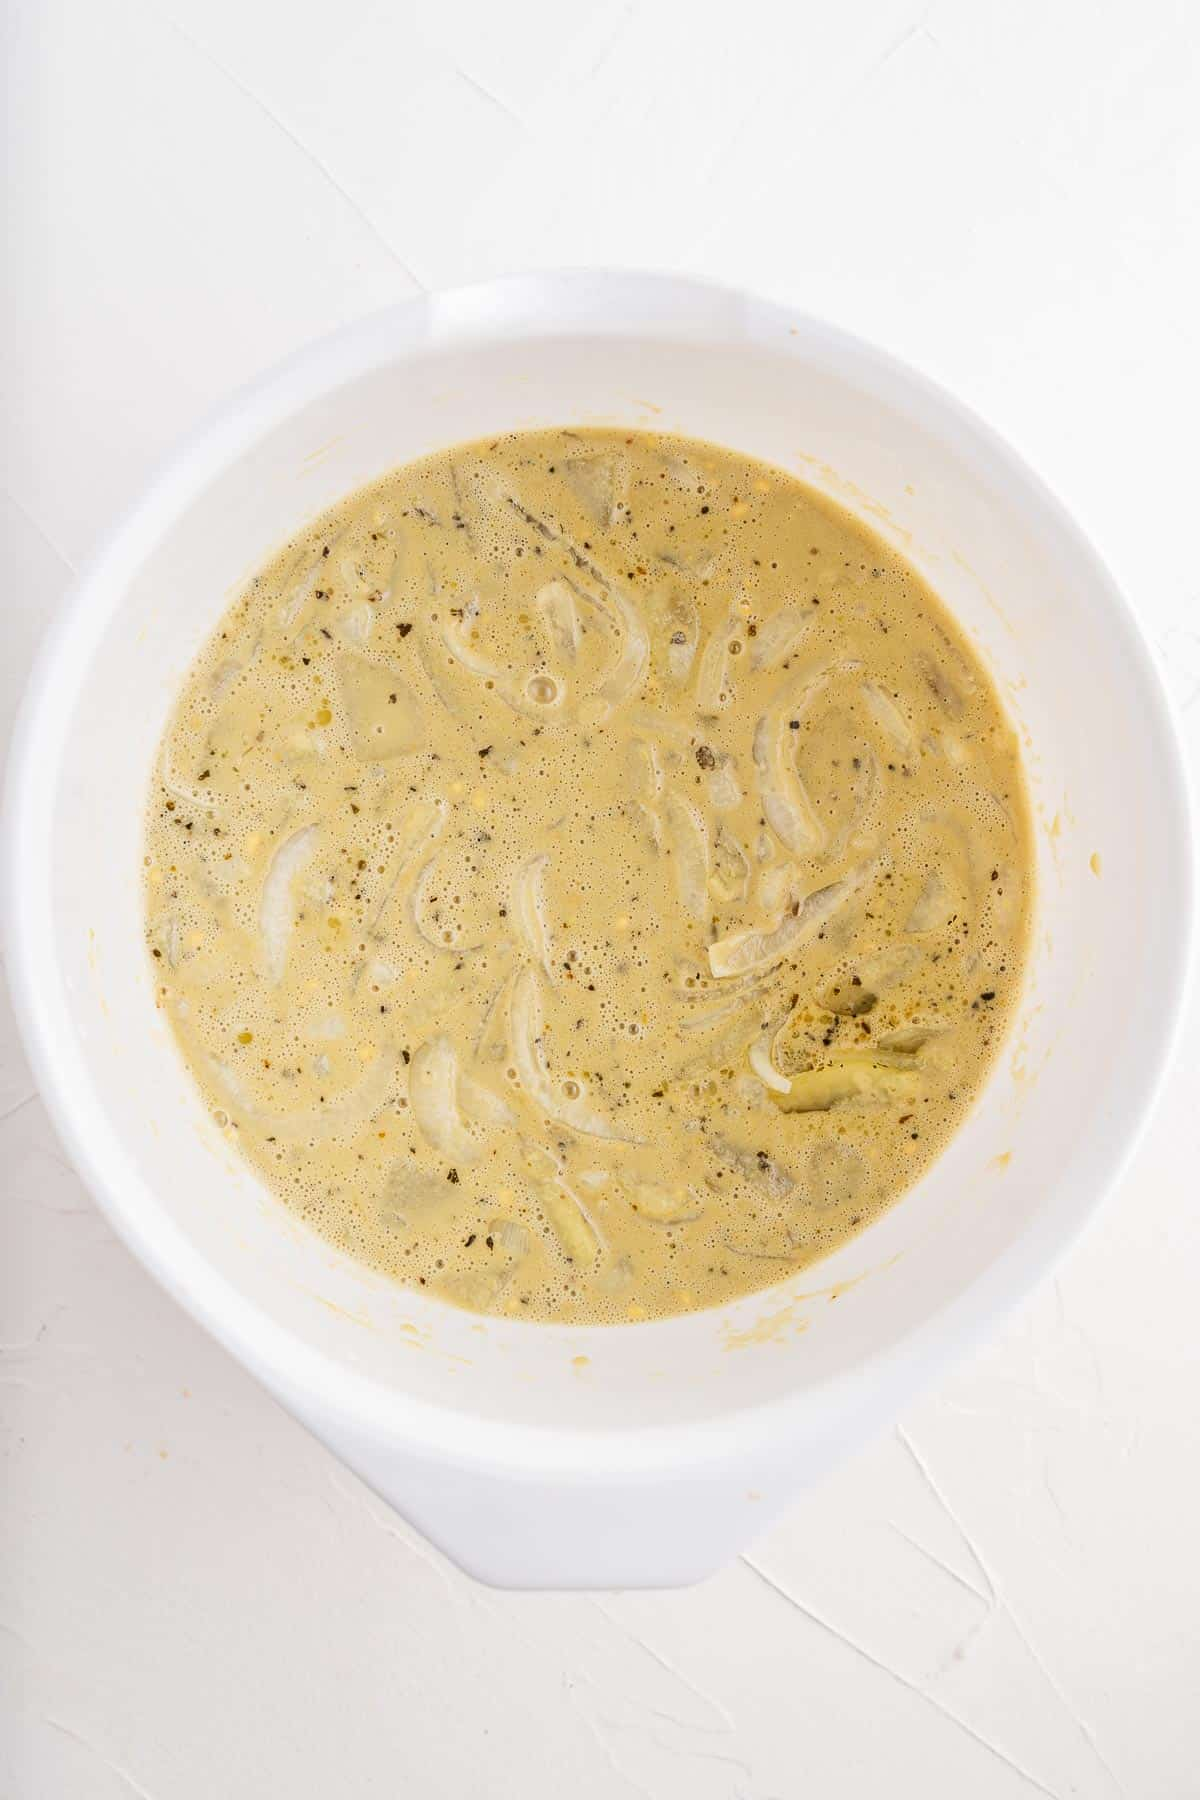 Chickpea, Potato, and Onion Batter